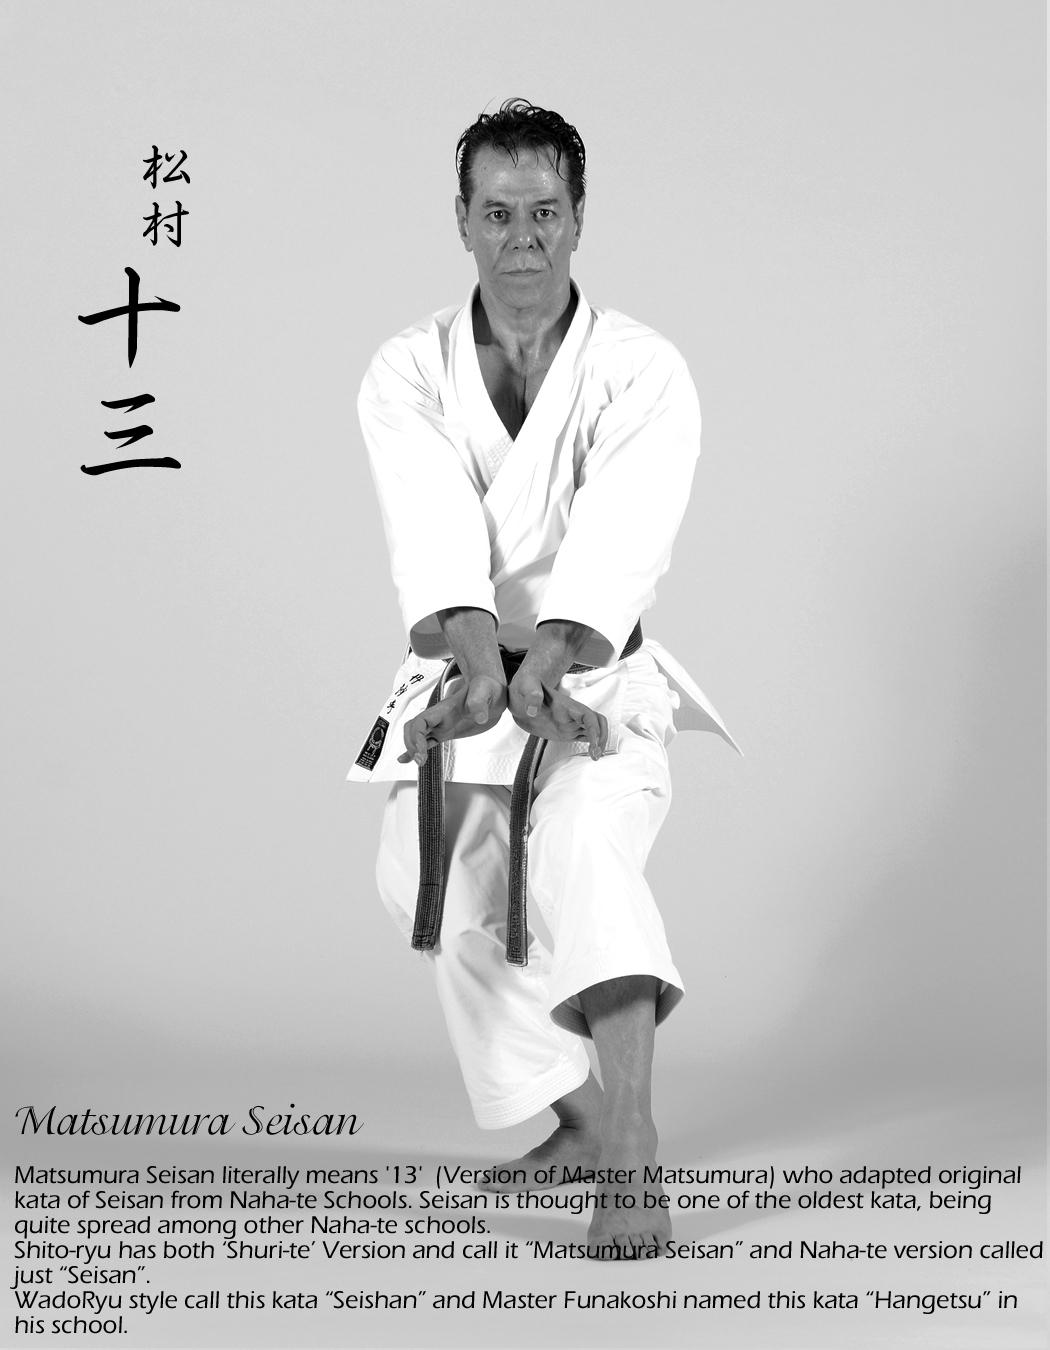 Sensei Tanzadeh performing Matsumura Seisan